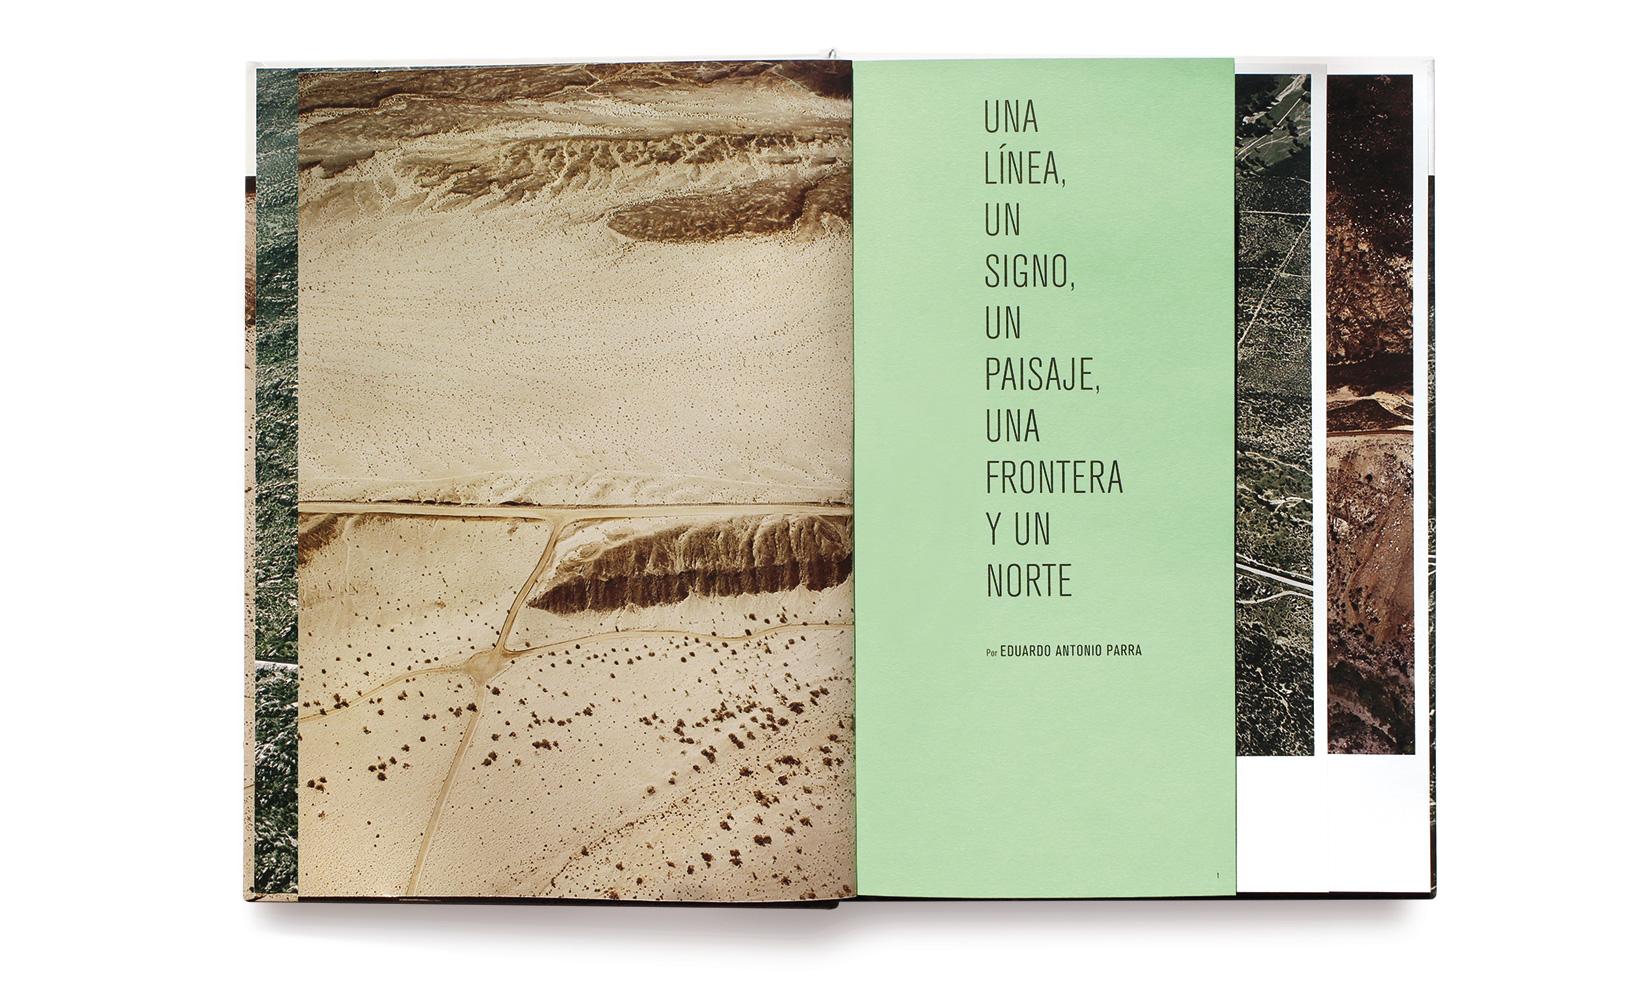 01-olivier-andreotti-toluca-studio-frontera-03.jpg